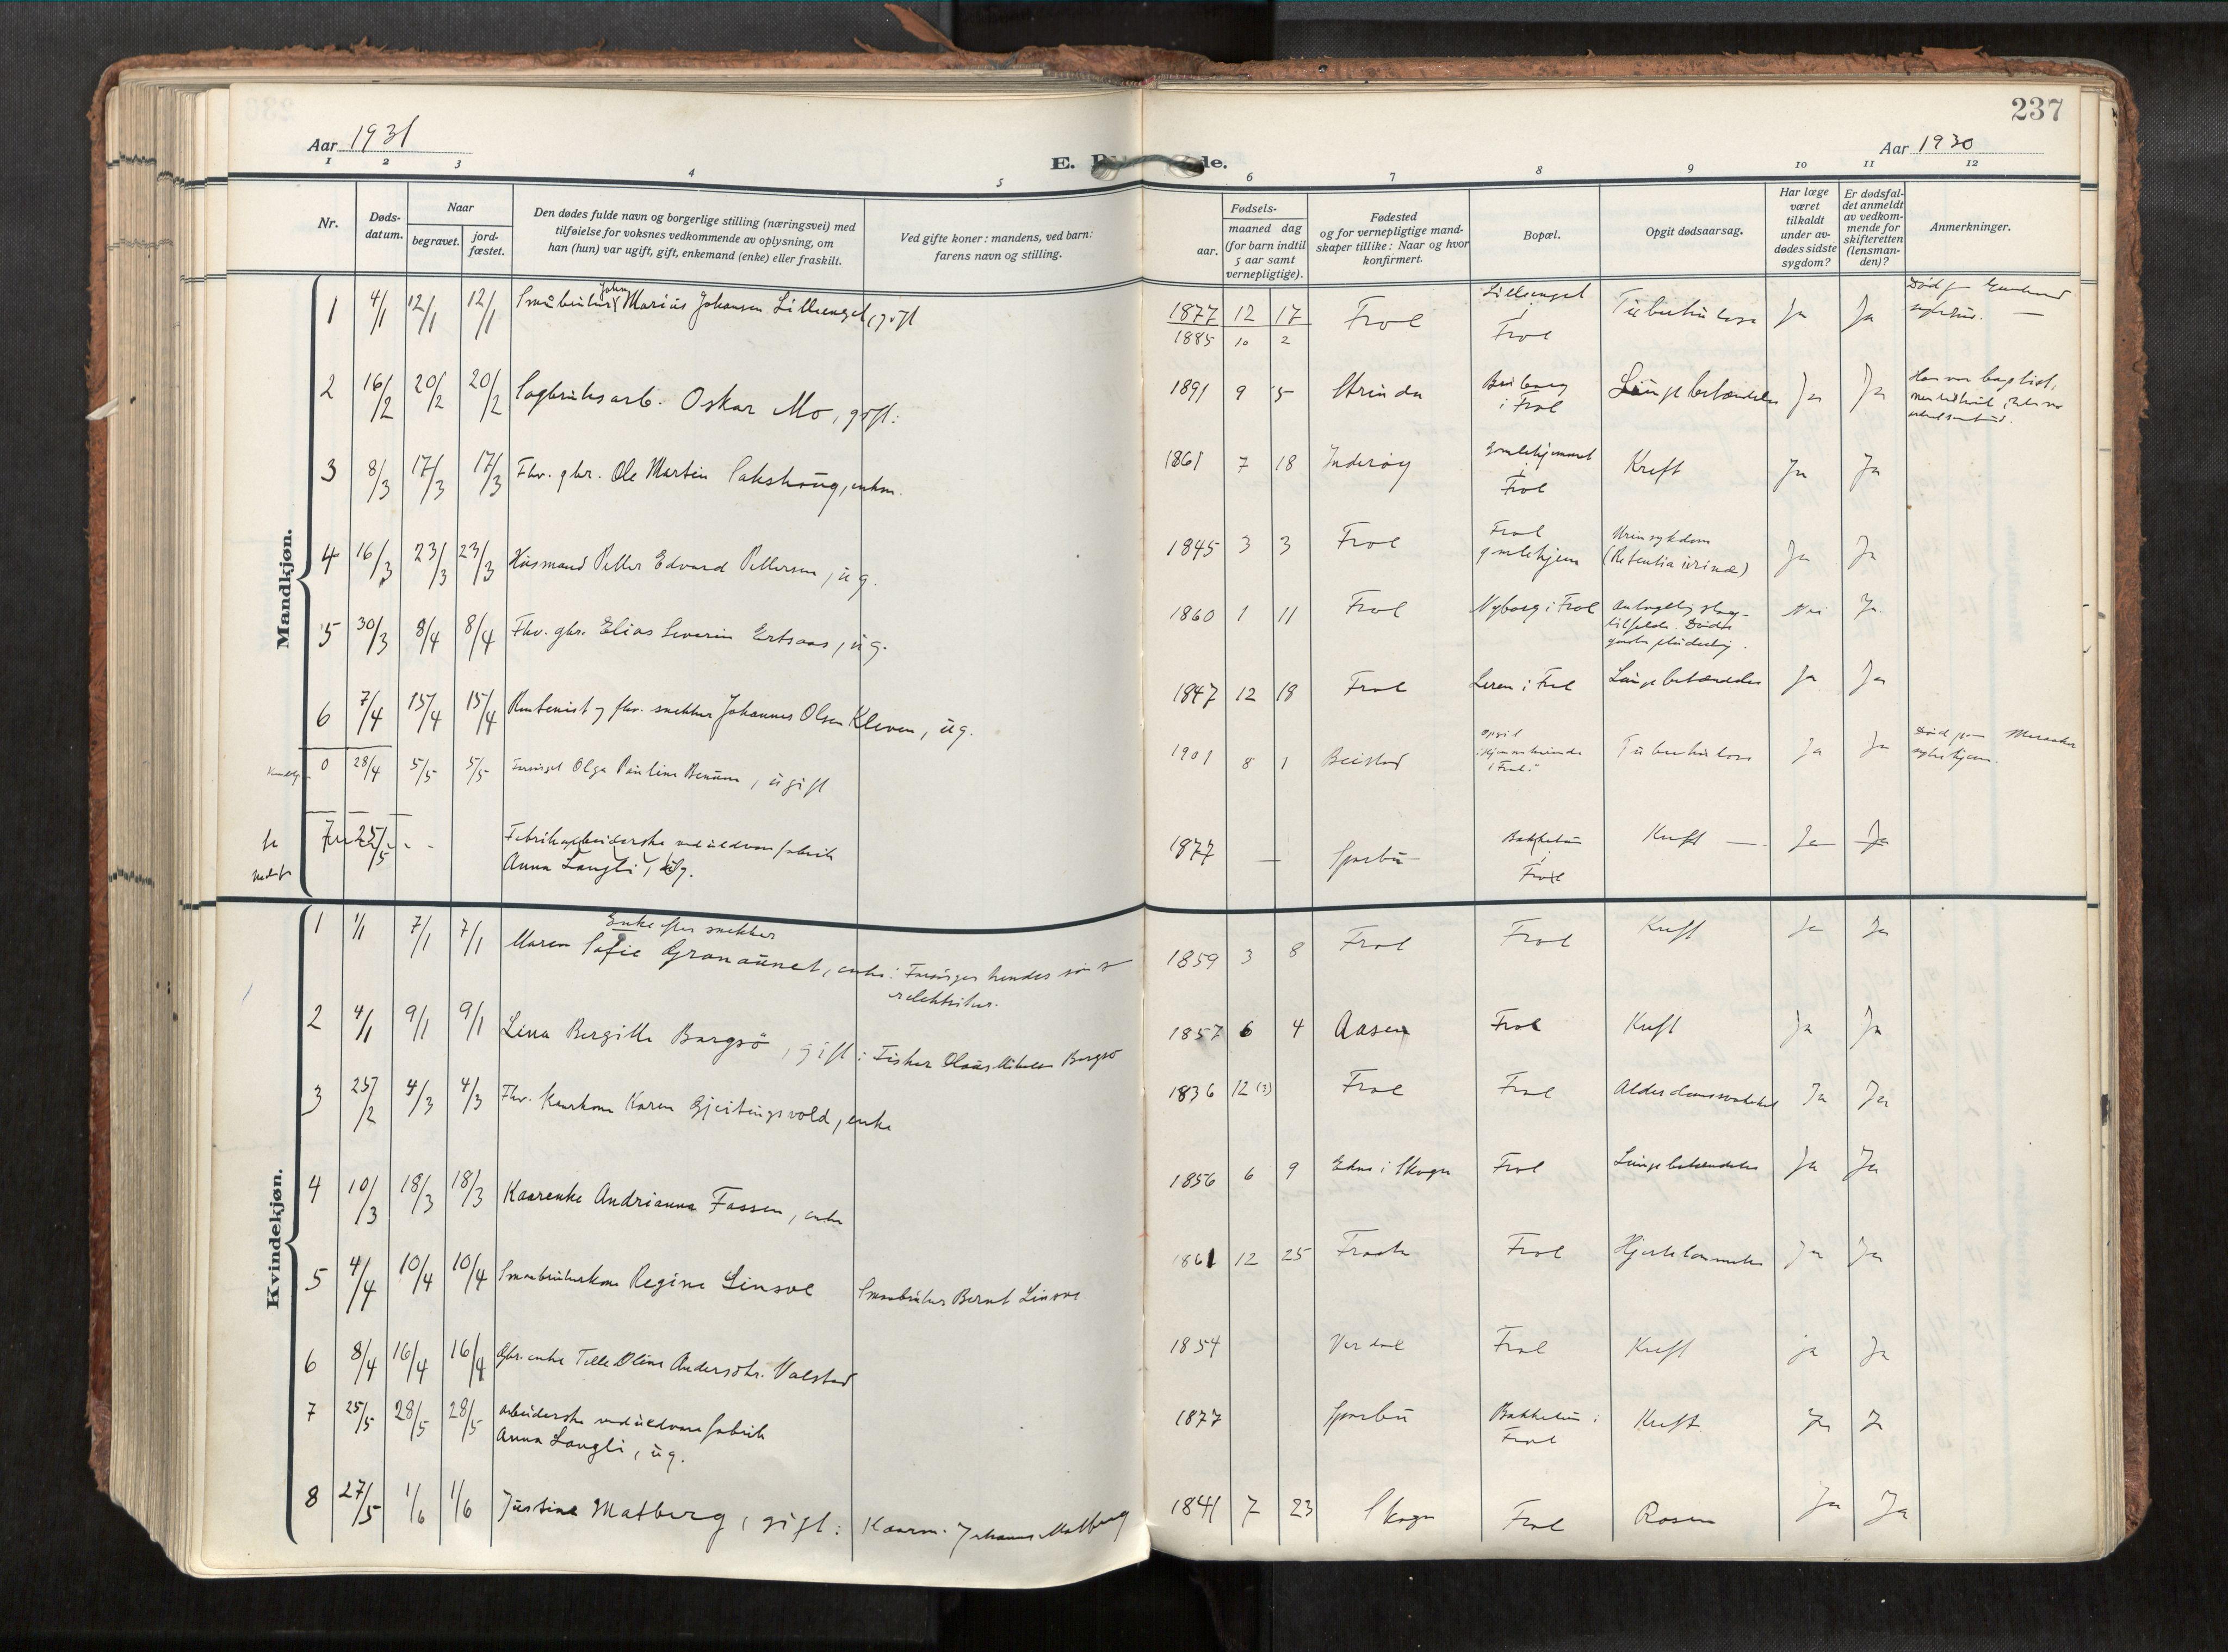 SAT, Levanger sokneprestkontor*, Parish register (official) no. 1, 1912-1935, p. 237